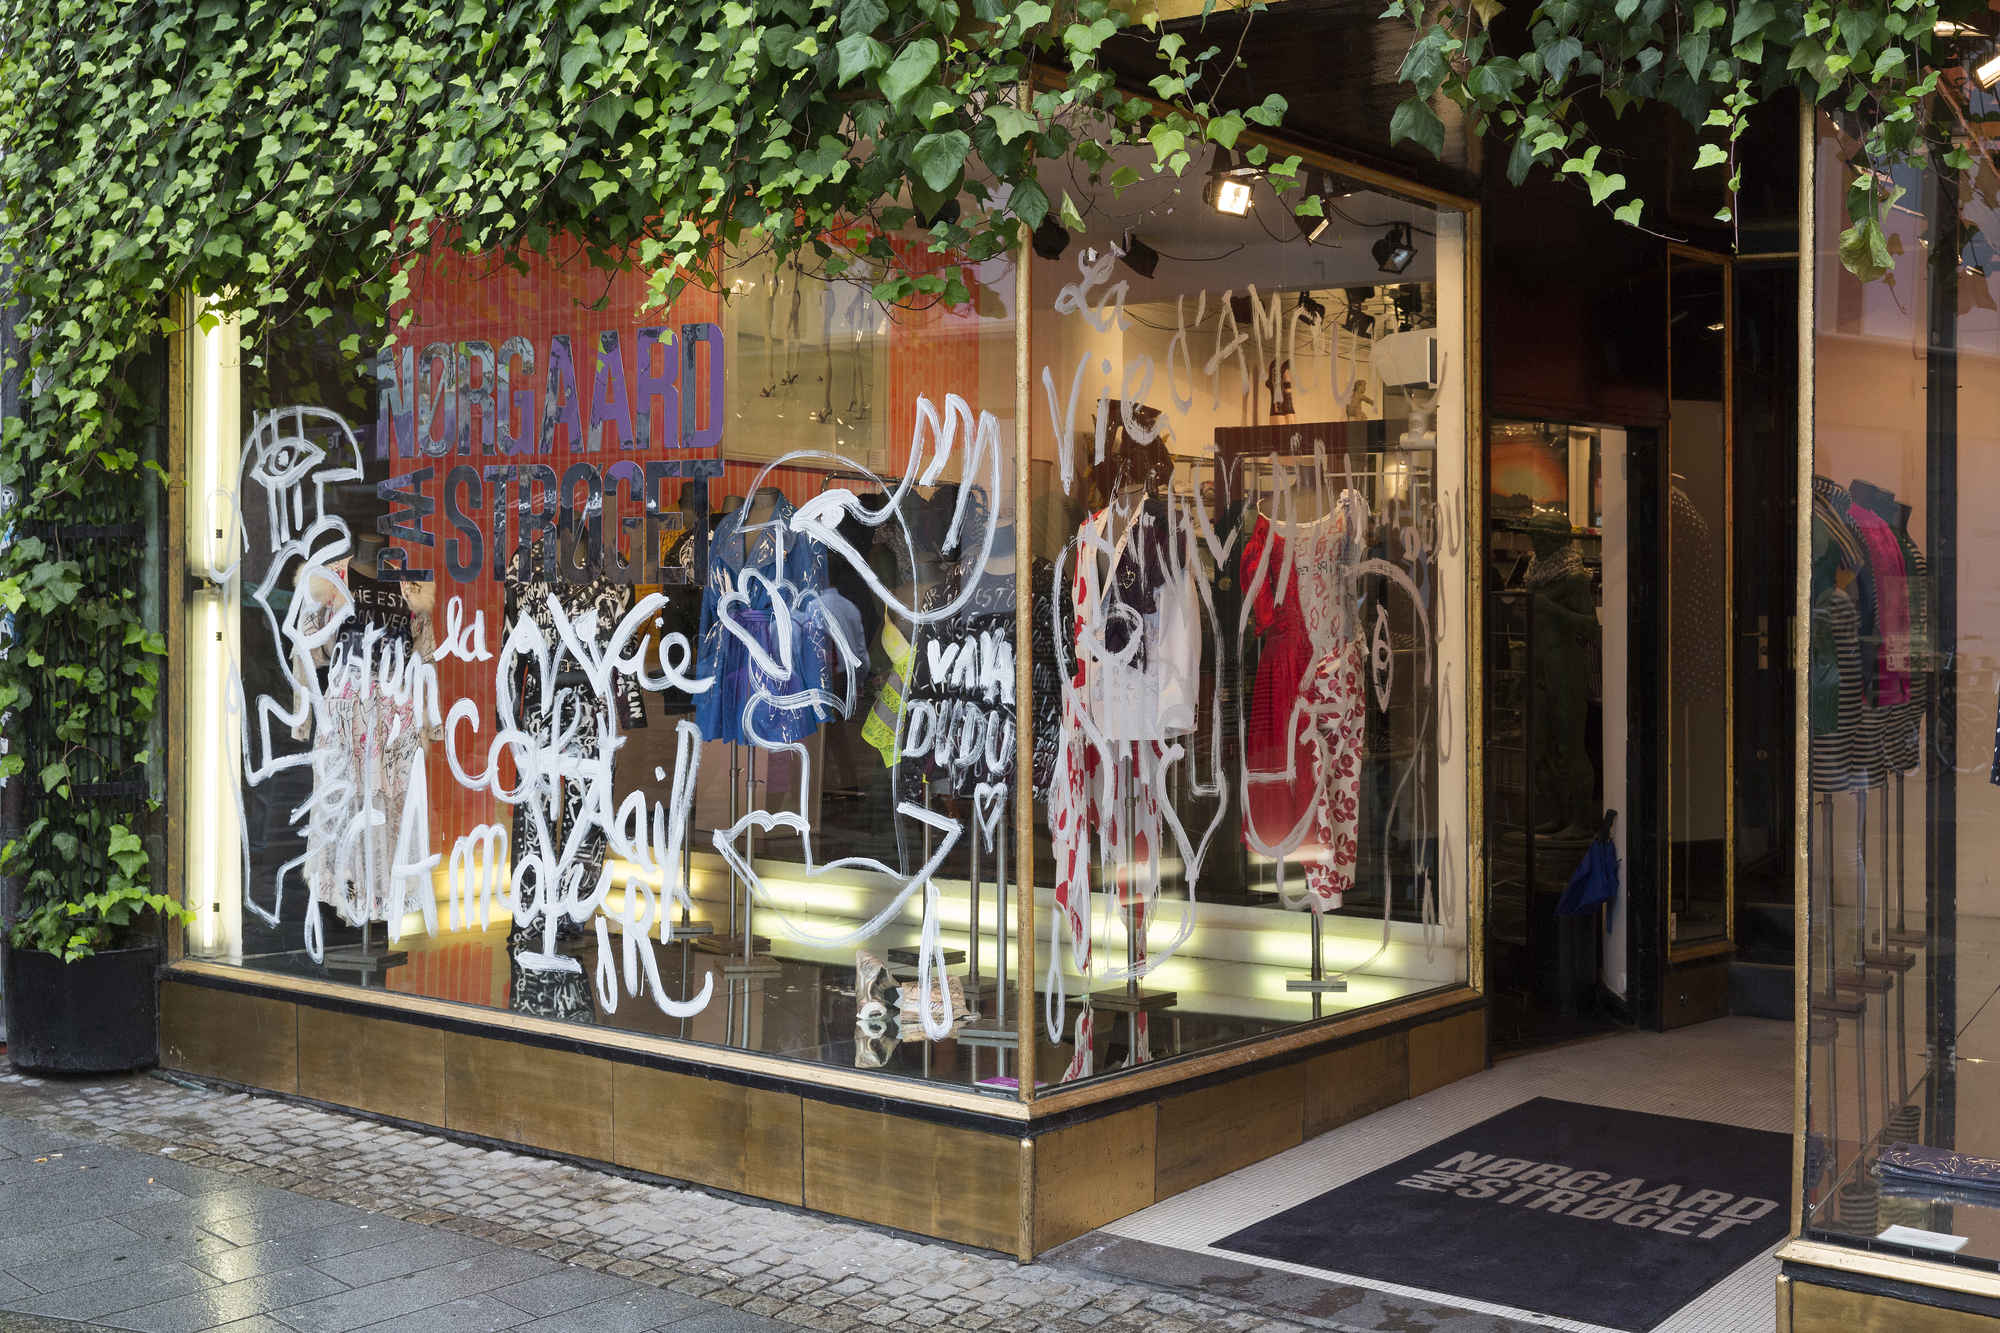 Vava Dudu.The Boutique.Norgaard Paa Stroeget.credit Torben Eskerod